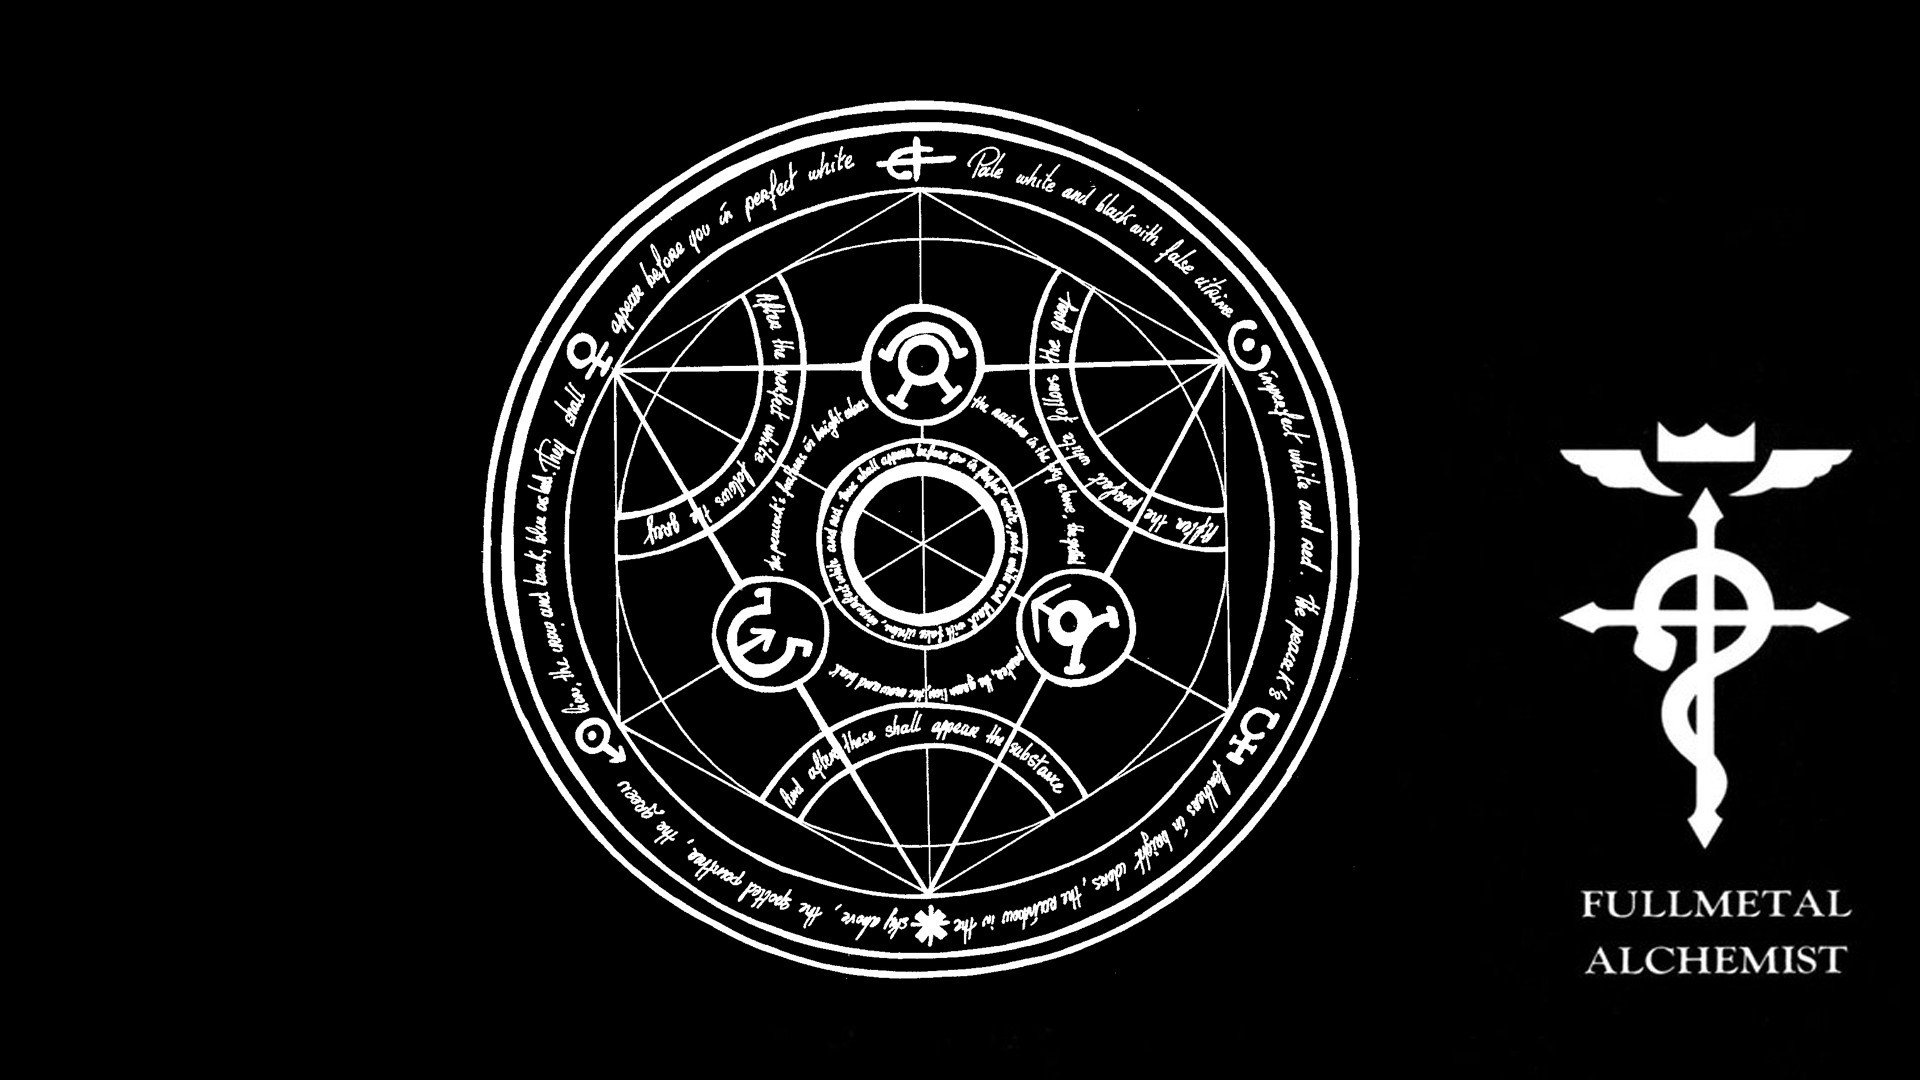 Fullmetal Alchemist: Brotherhood Wallpapers (78 Wallpapers) – HD Wallpapers